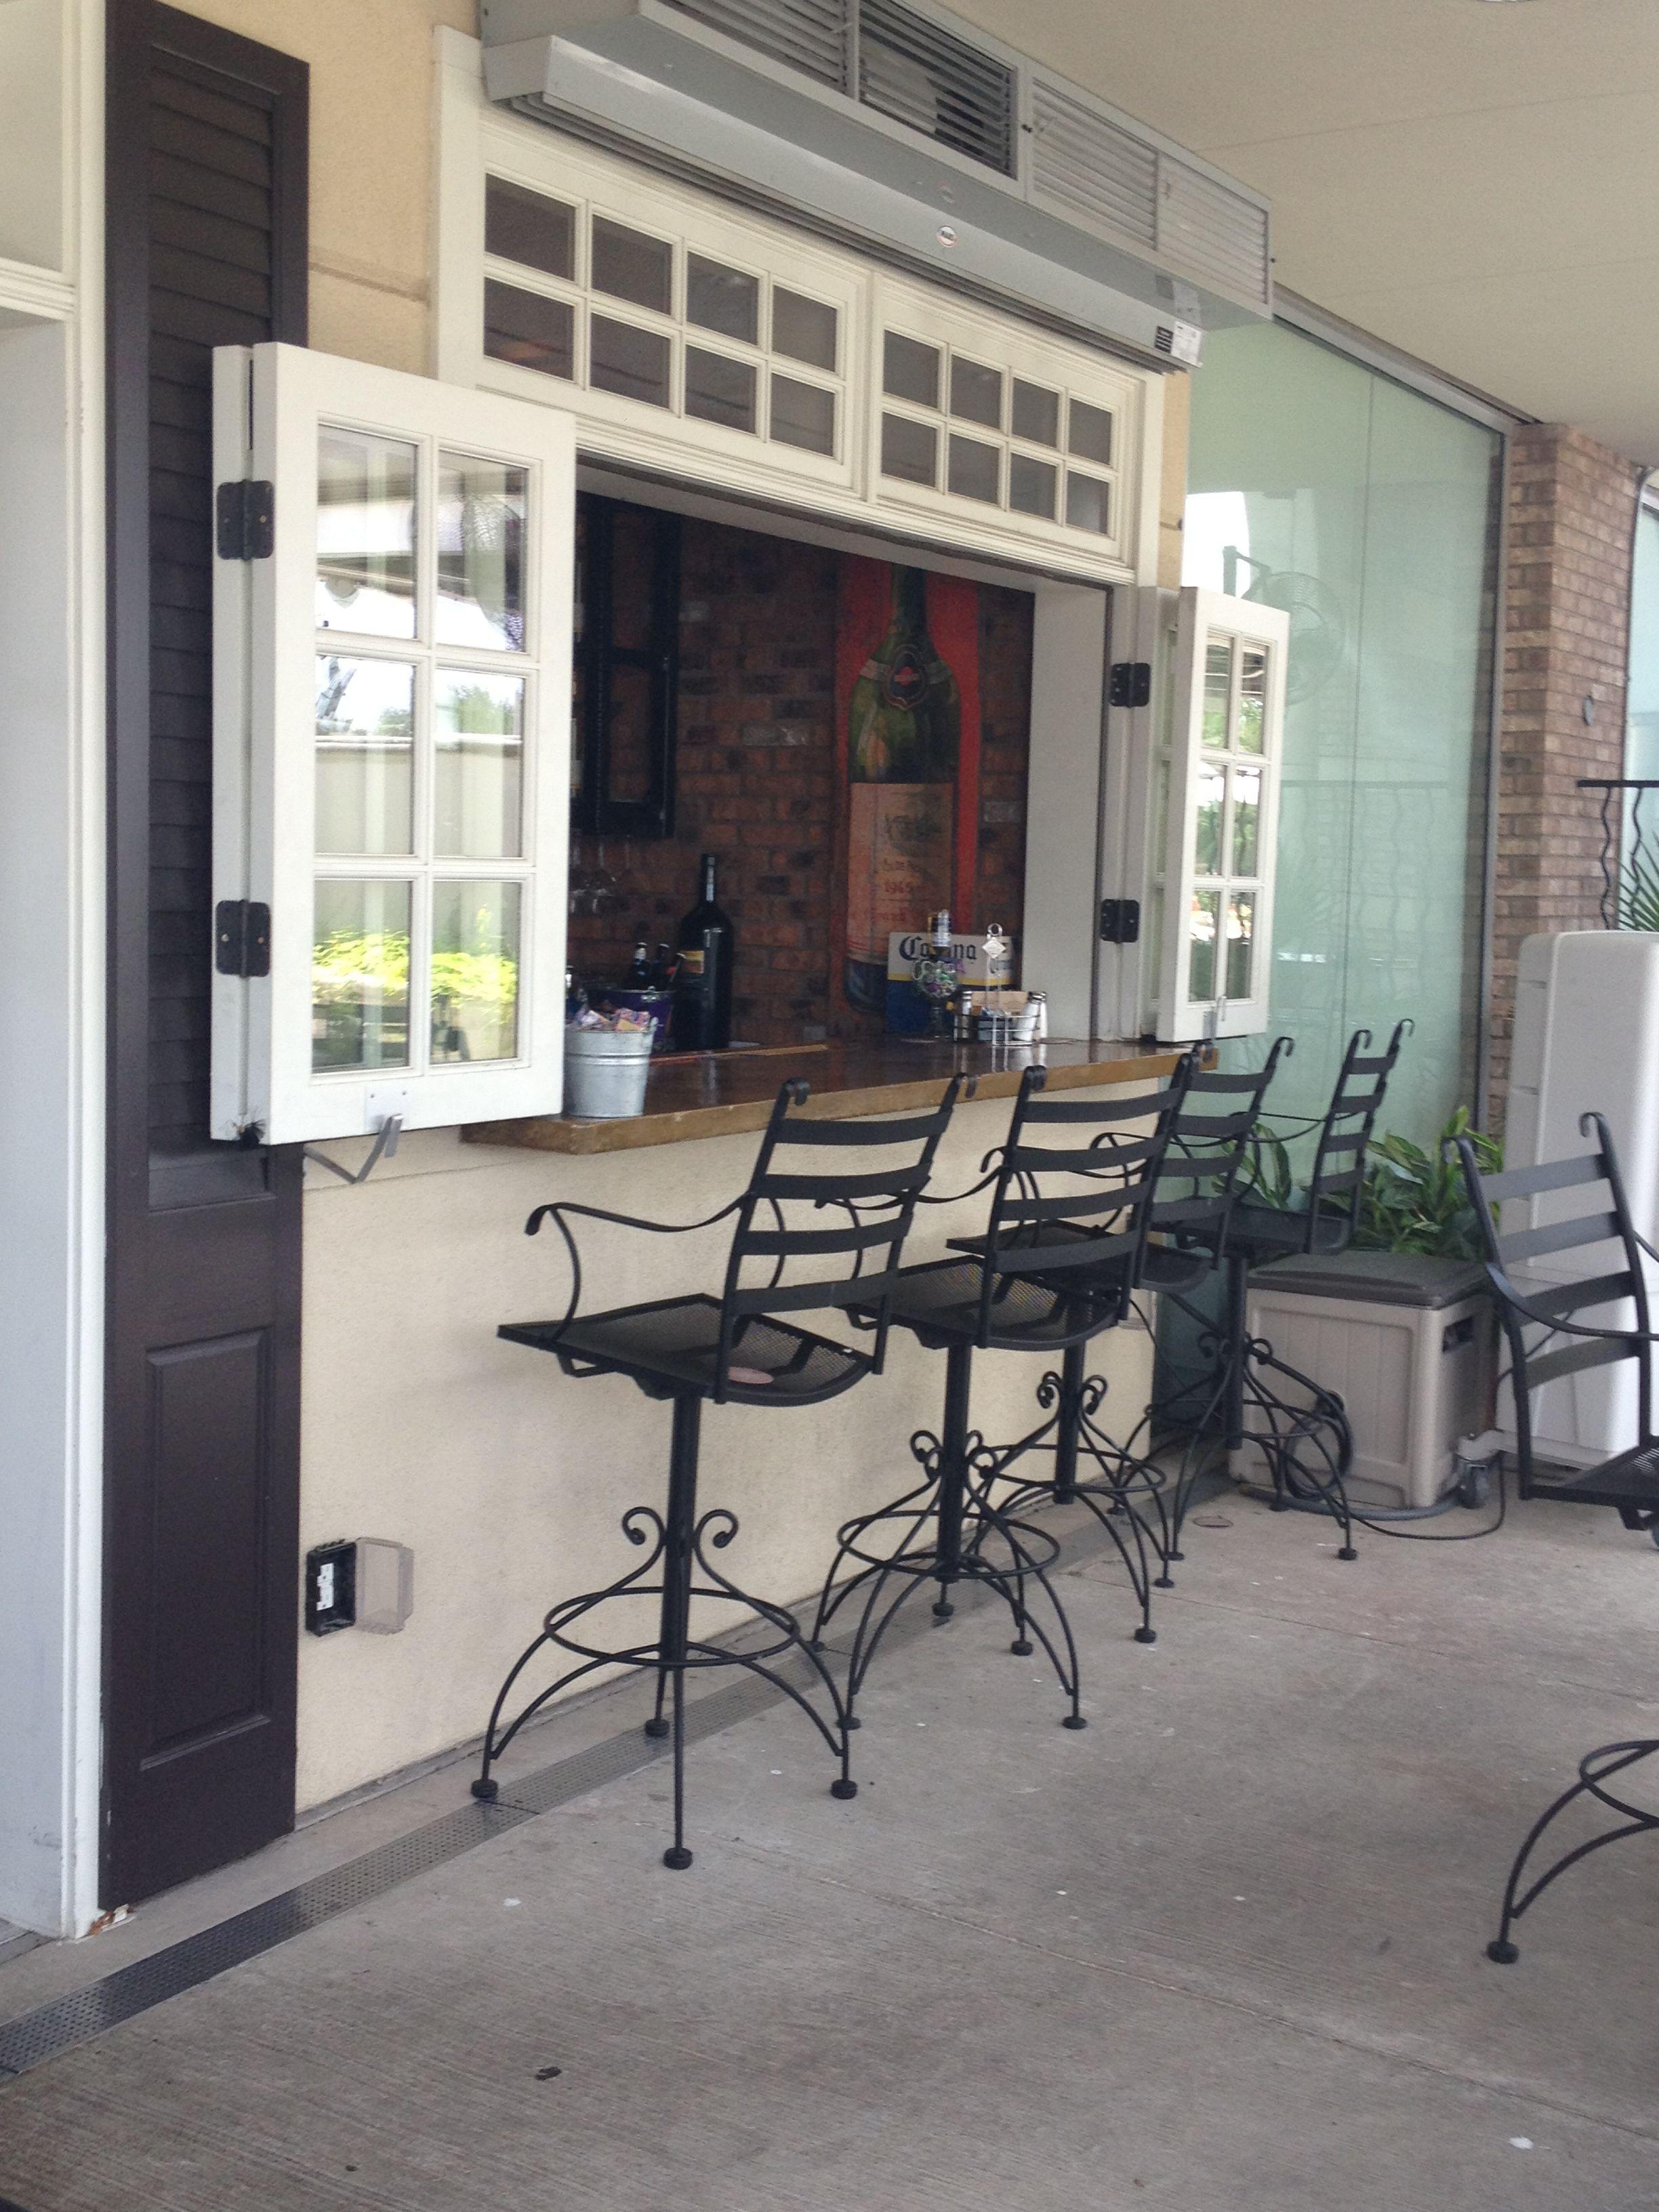 Kitchen servery window ideas  pass thru windowbar  outdoor bar ideas  pinterest  kitchen